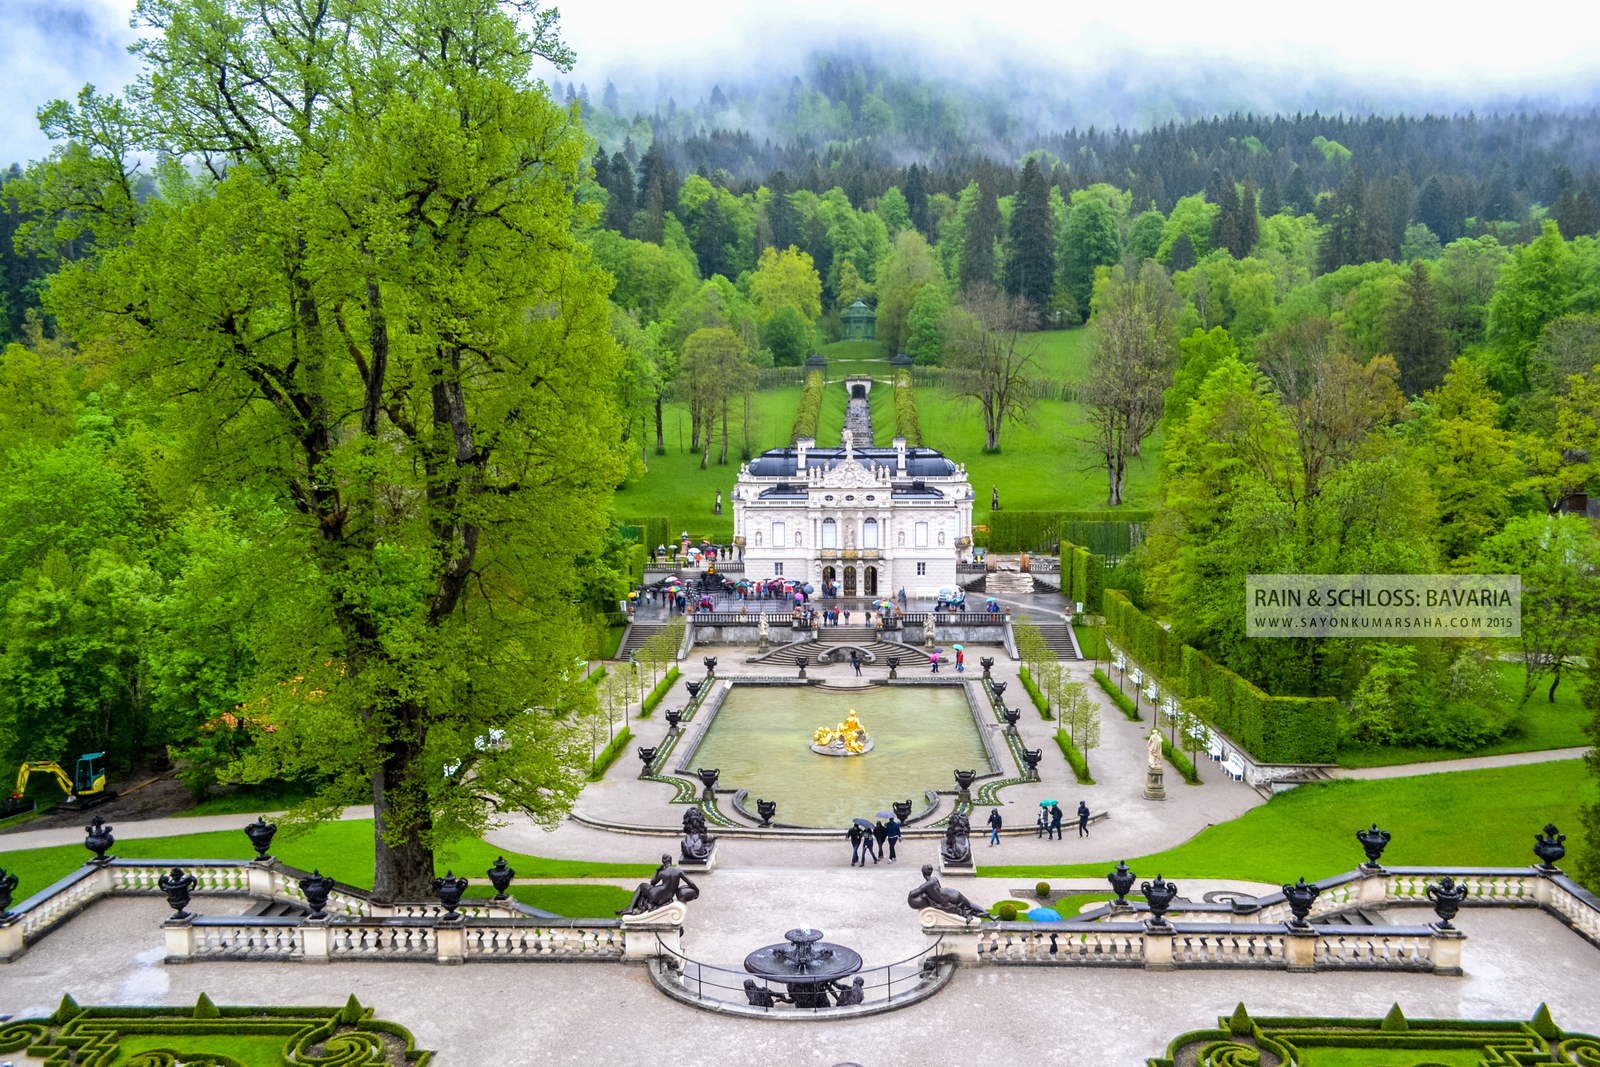 Rain & Schloss: Bavaria